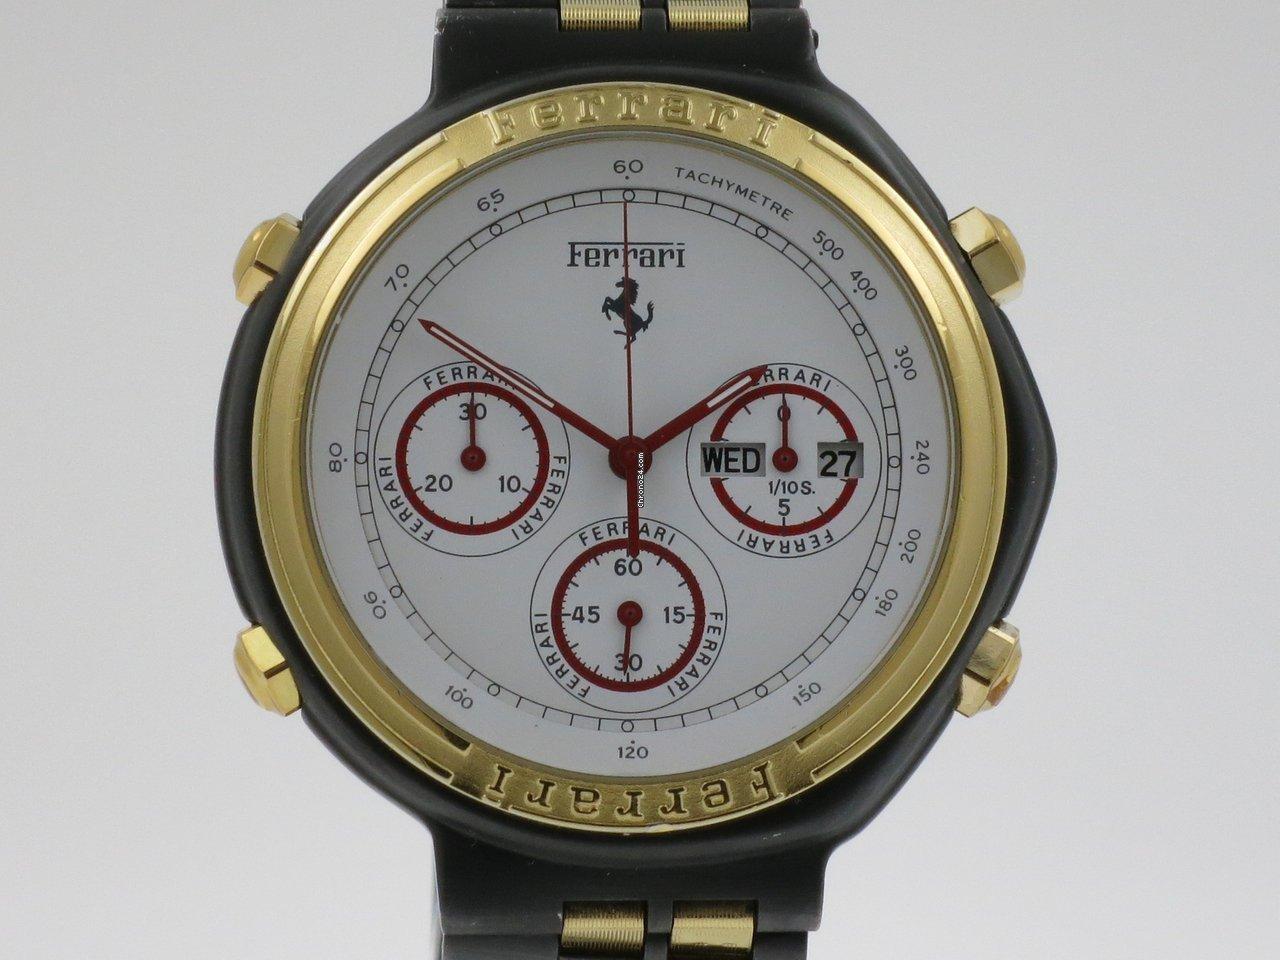 watches for bang hublot anniversary sale watch ferrari new insider big usa s business hublots